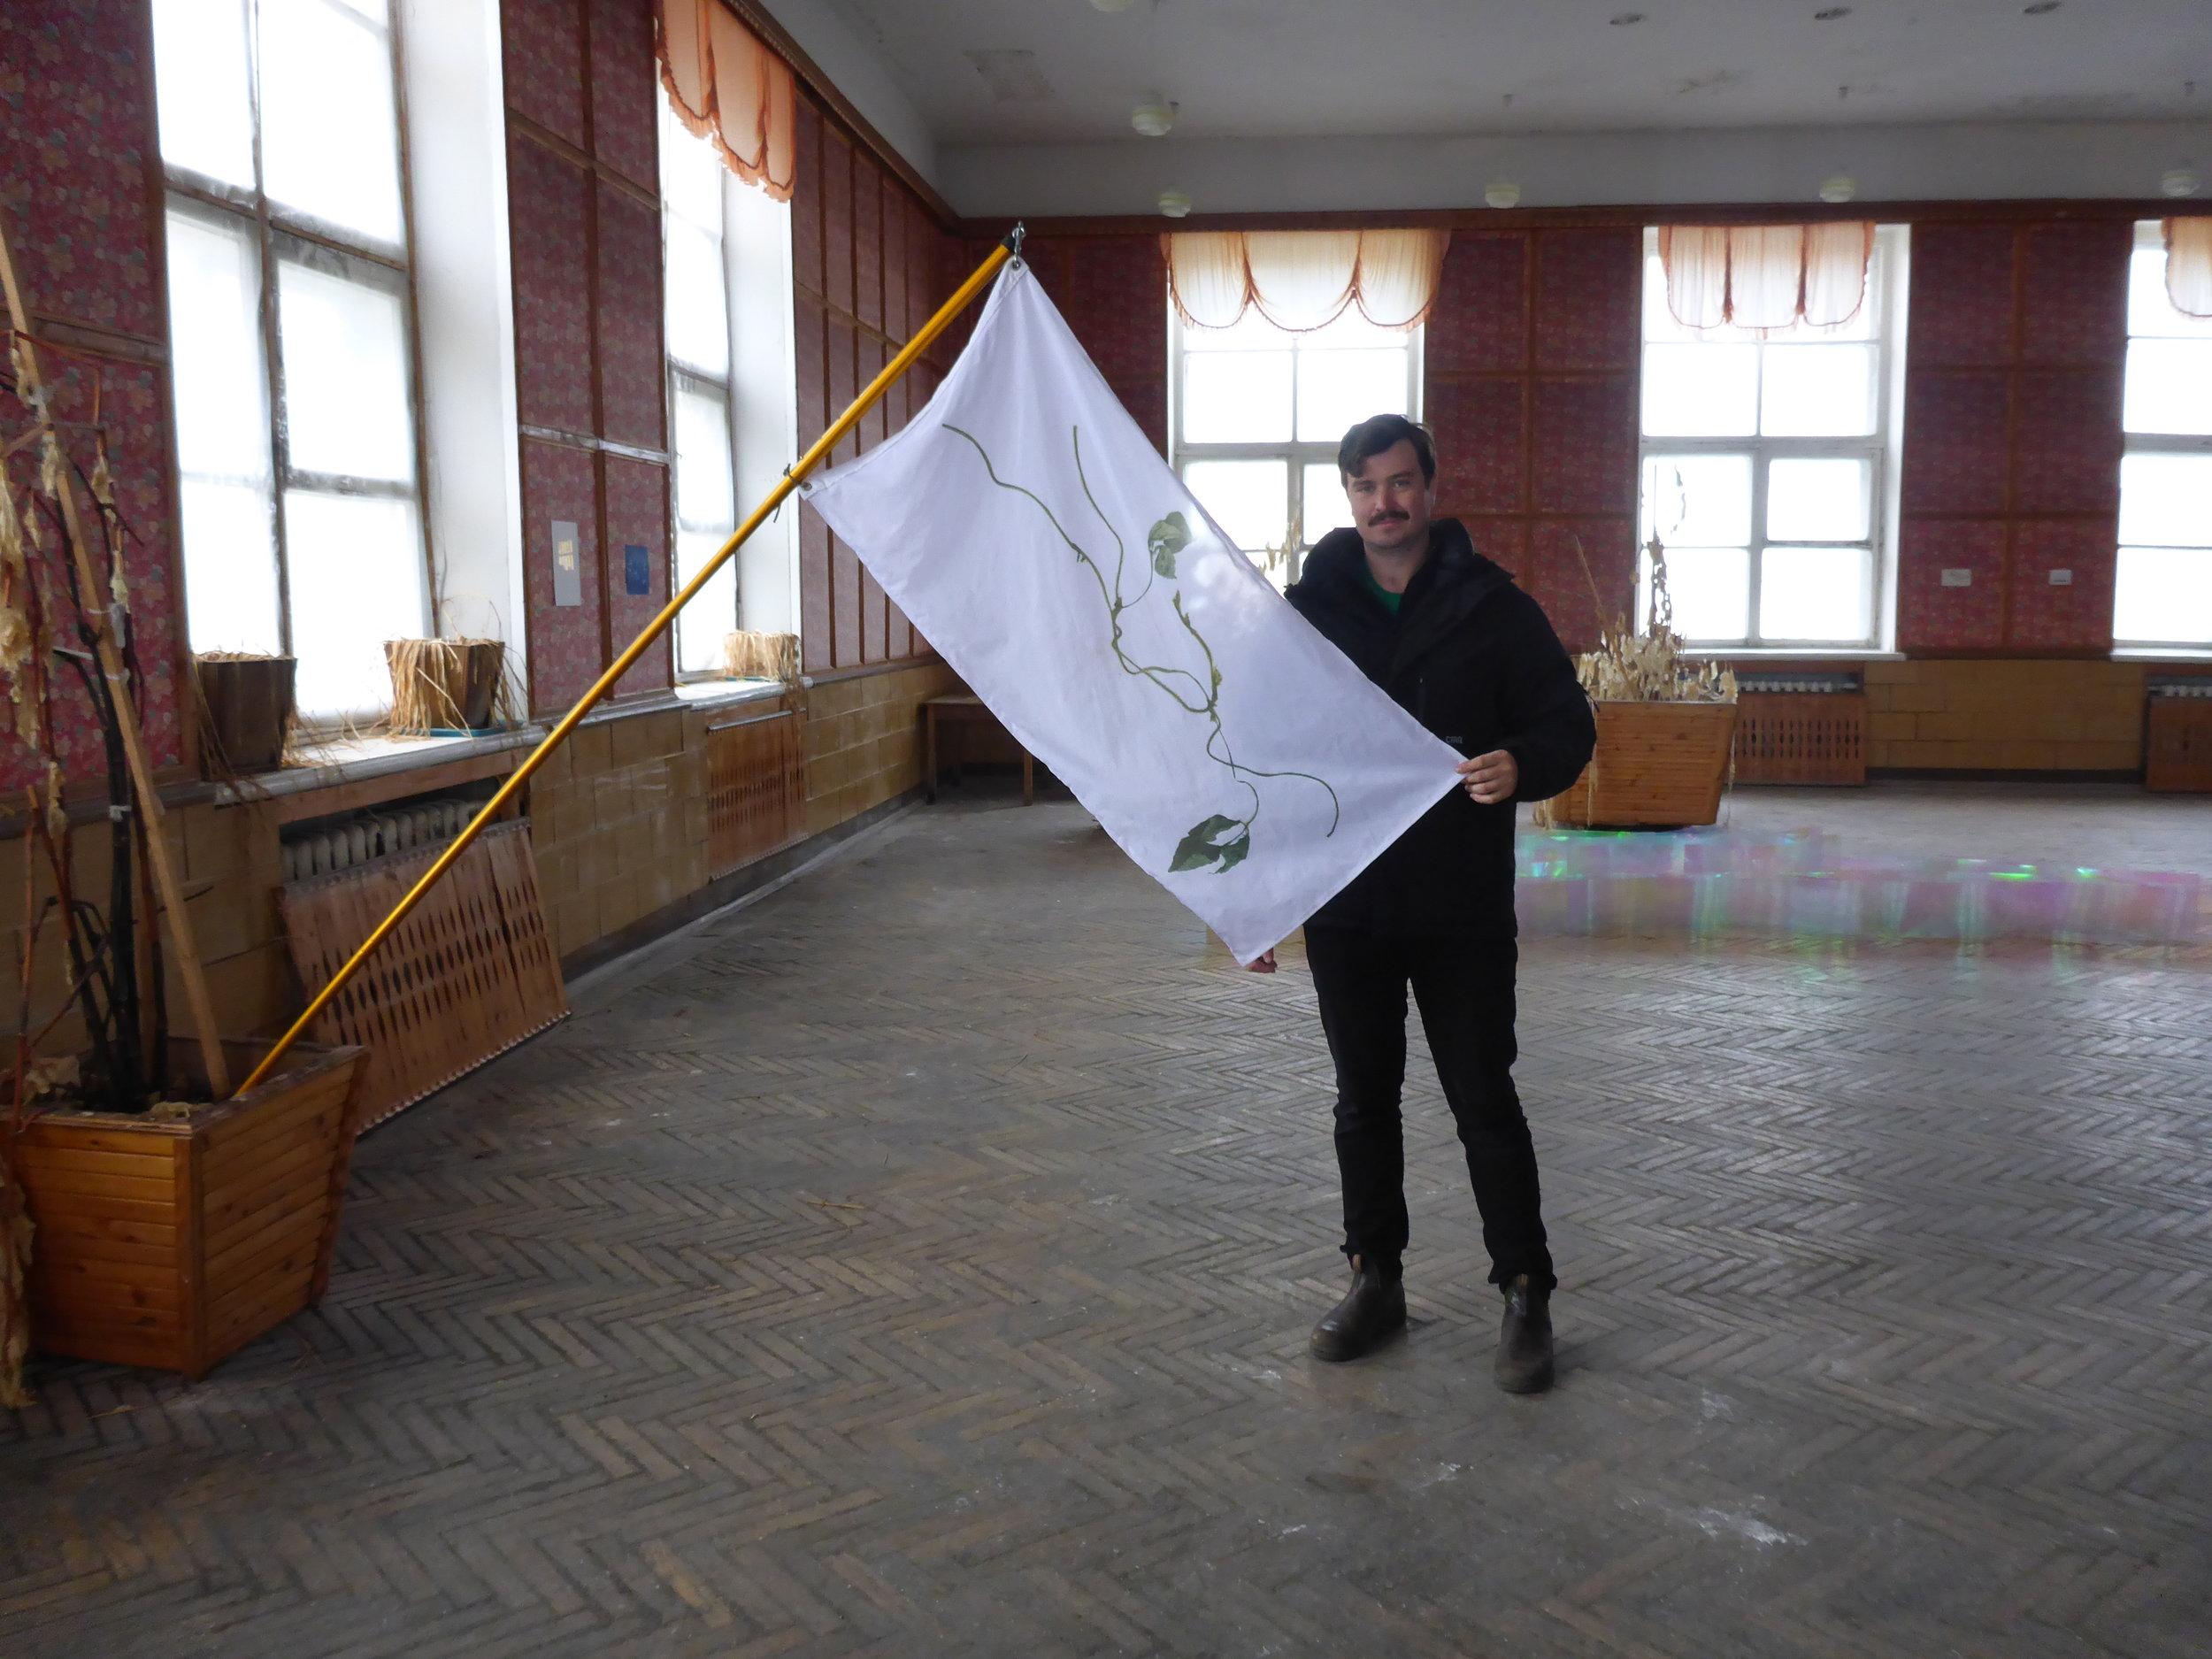 Stephan Jahanshahi, Printed nylon flag, aluminum pole, hardware,Pyramiden Canteen, Svalbard, Norway, July 2016